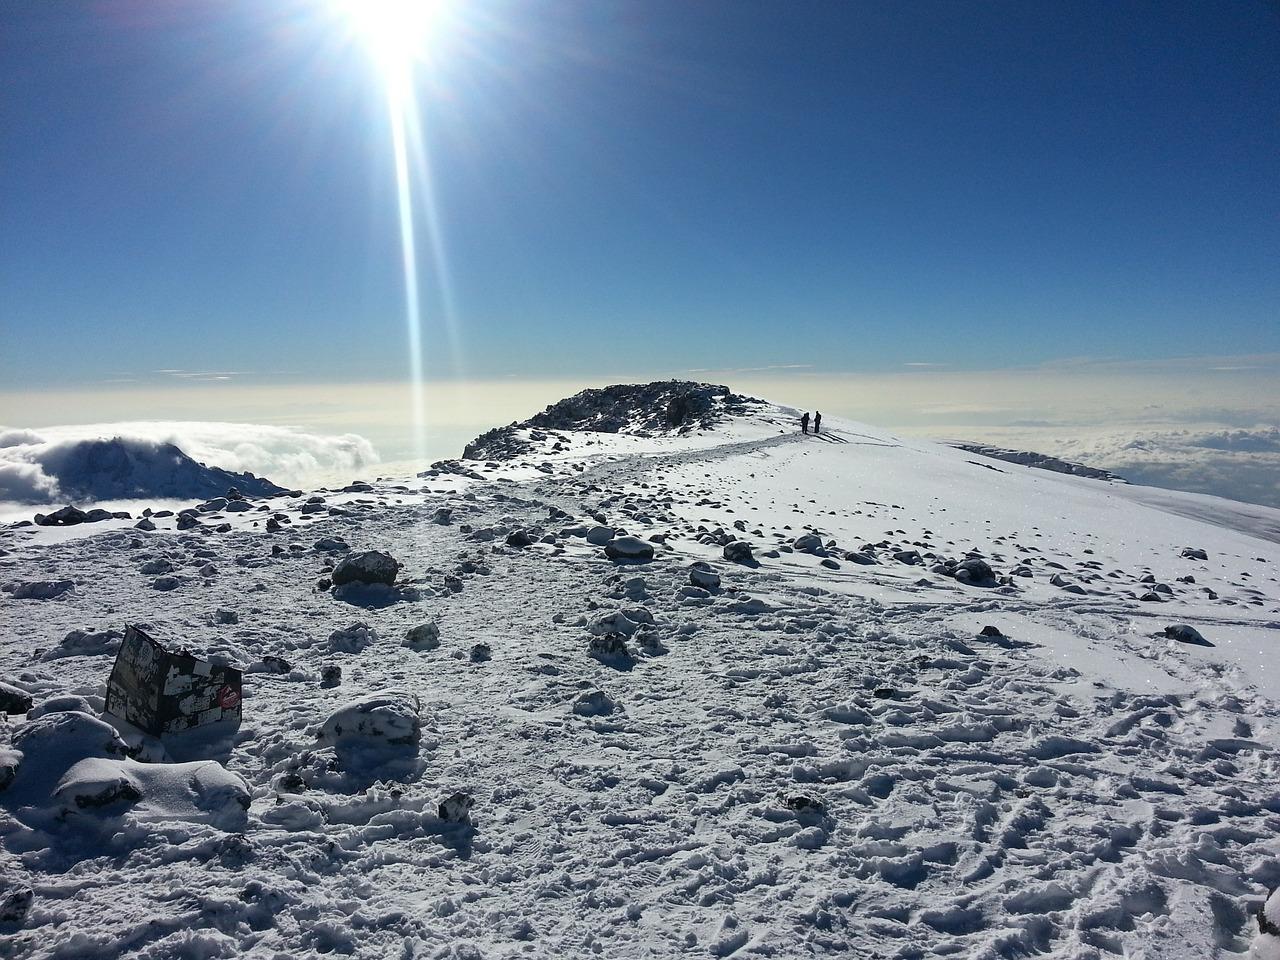 Mount Kilimanjaro Special